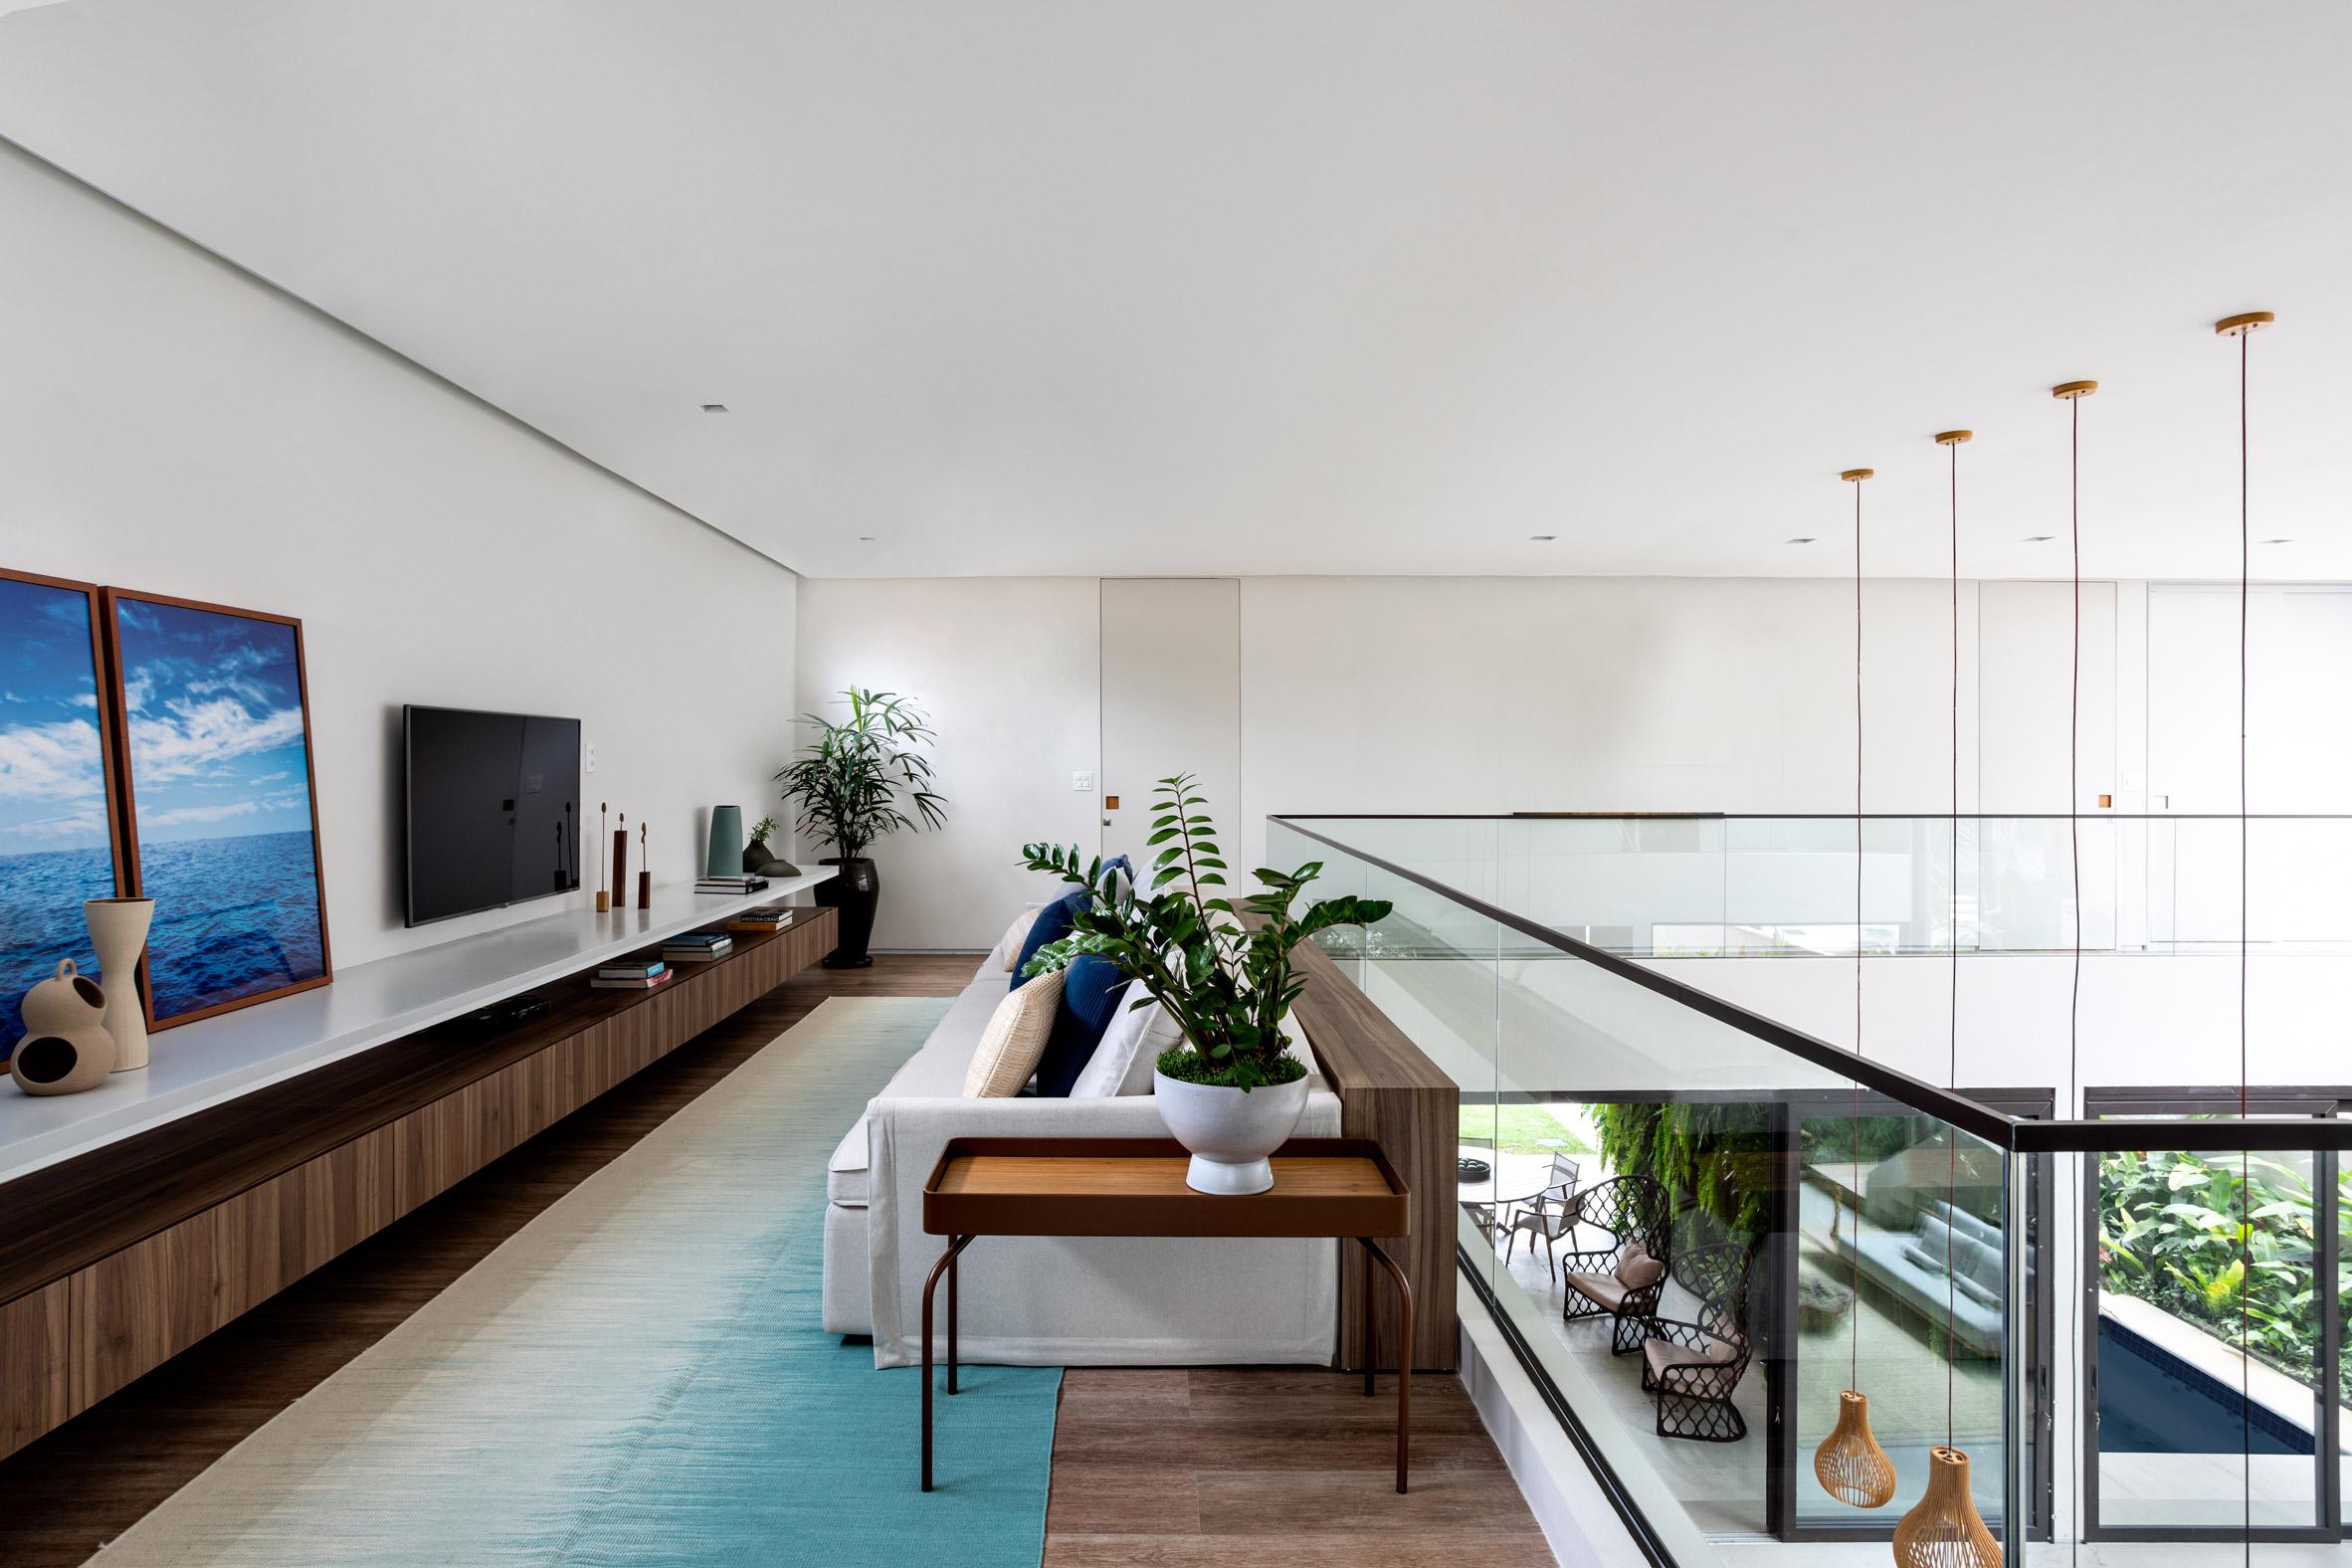 House NK by Rua 141 and Zalc Arquitetura